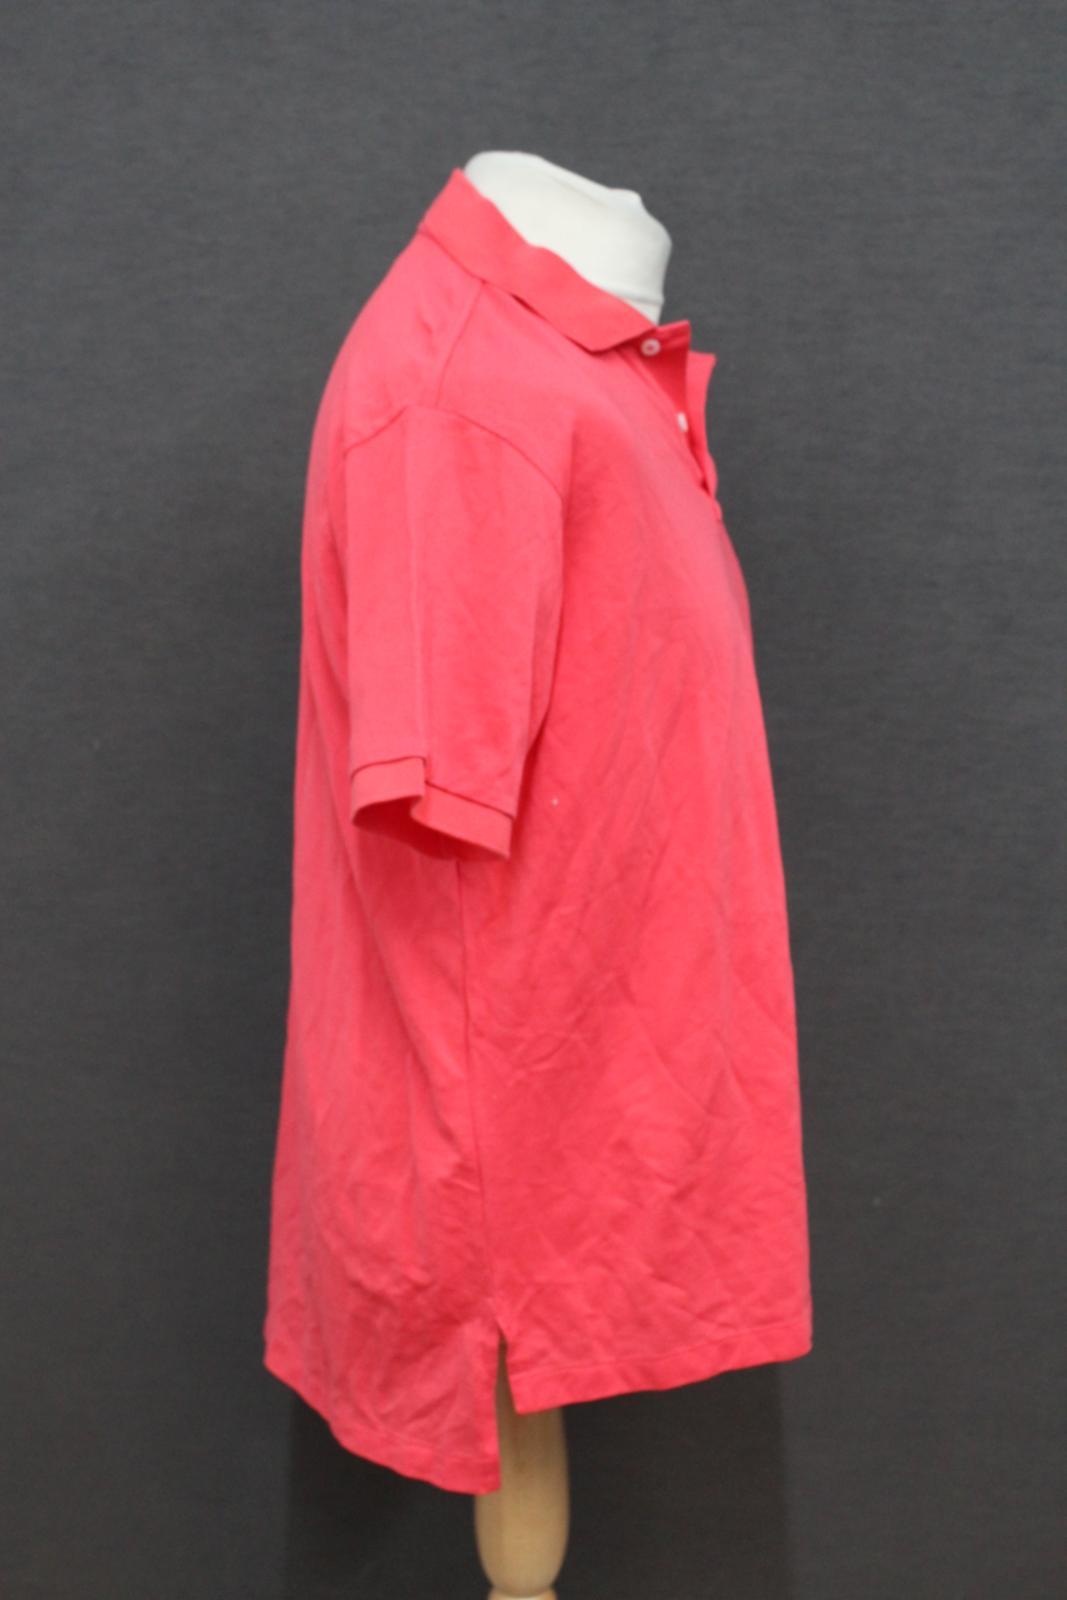 Ralph-Lauren-Polo-para-hombre-de-color-rosa-de-algodon-Manga-Corta-Camisa-Polo-De-Ajuste miniatura 5